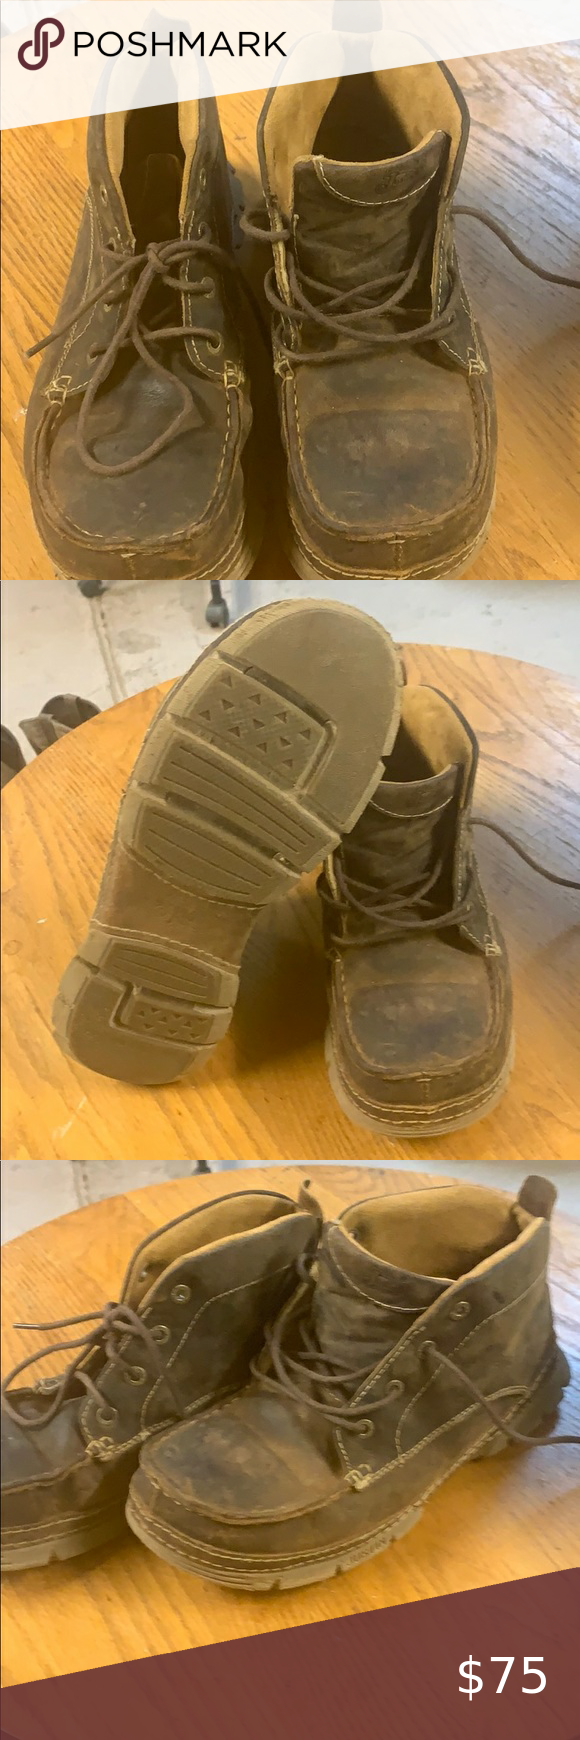 Steel toe, Justin boots, Chukka boots